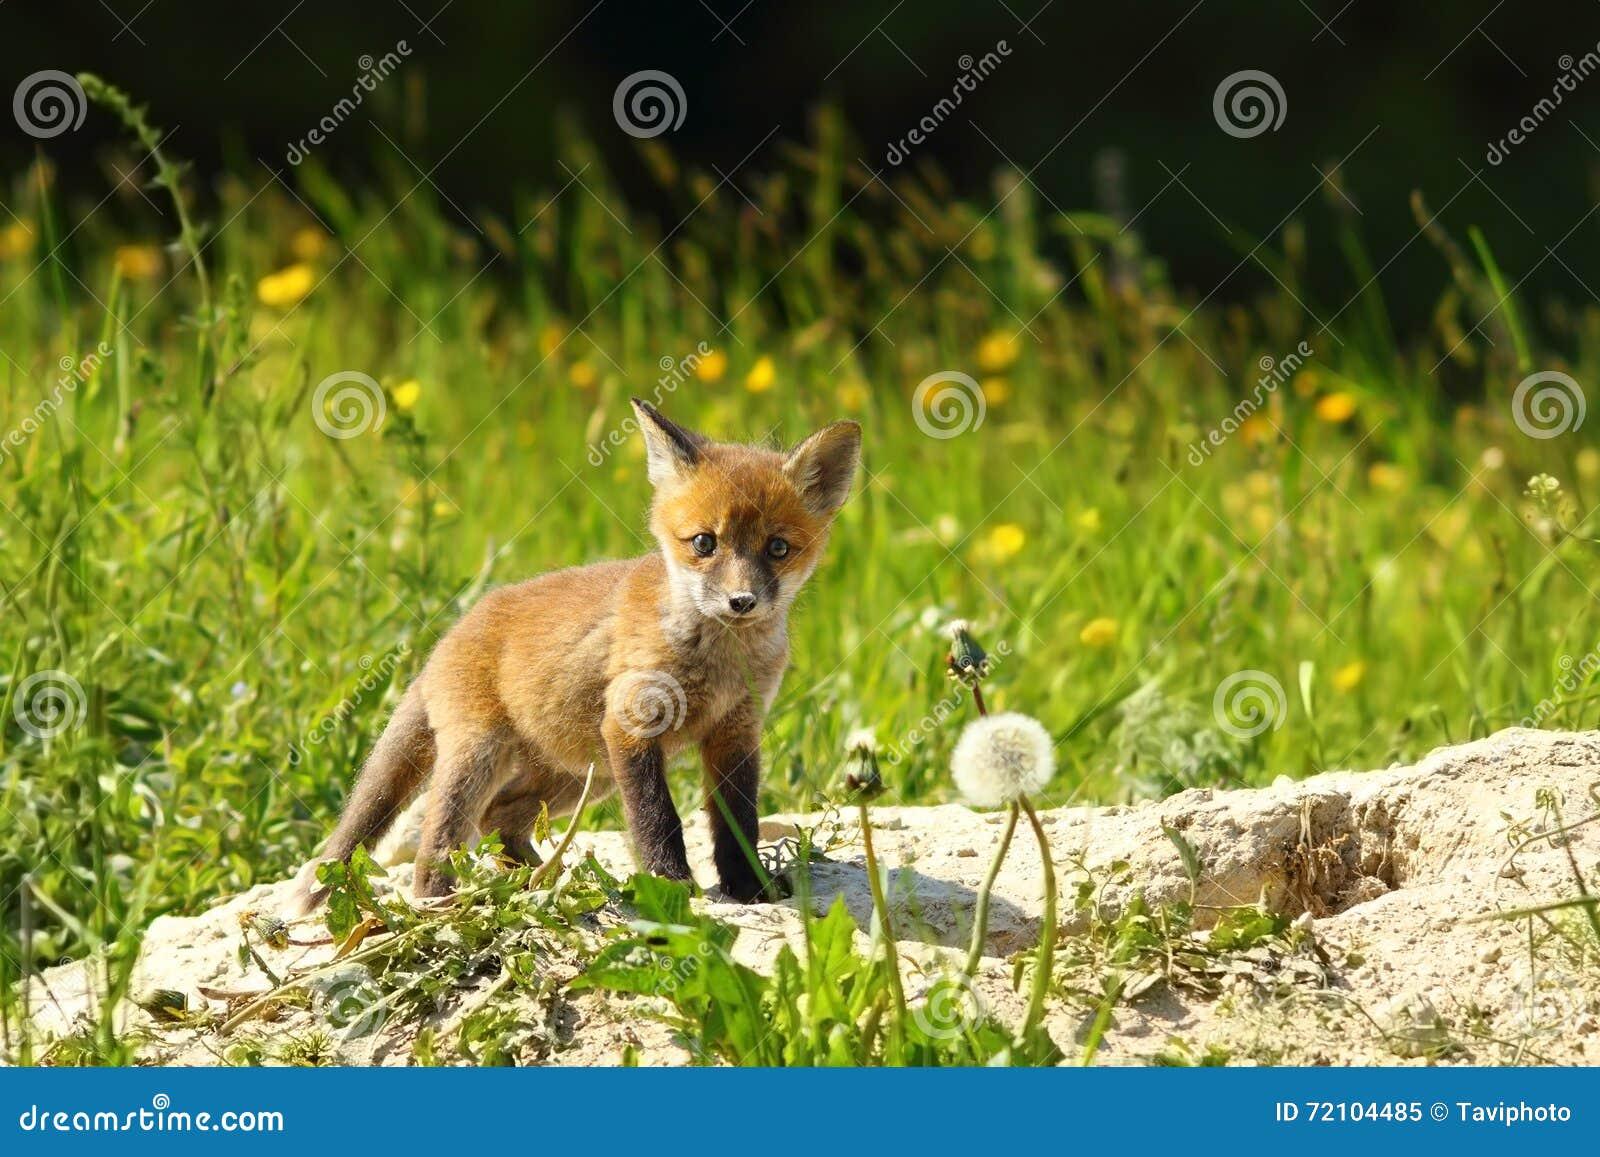 petit animal mignon de renard rouge regardant l 39 appareil photo image stock image du carnivore. Black Bedroom Furniture Sets. Home Design Ideas